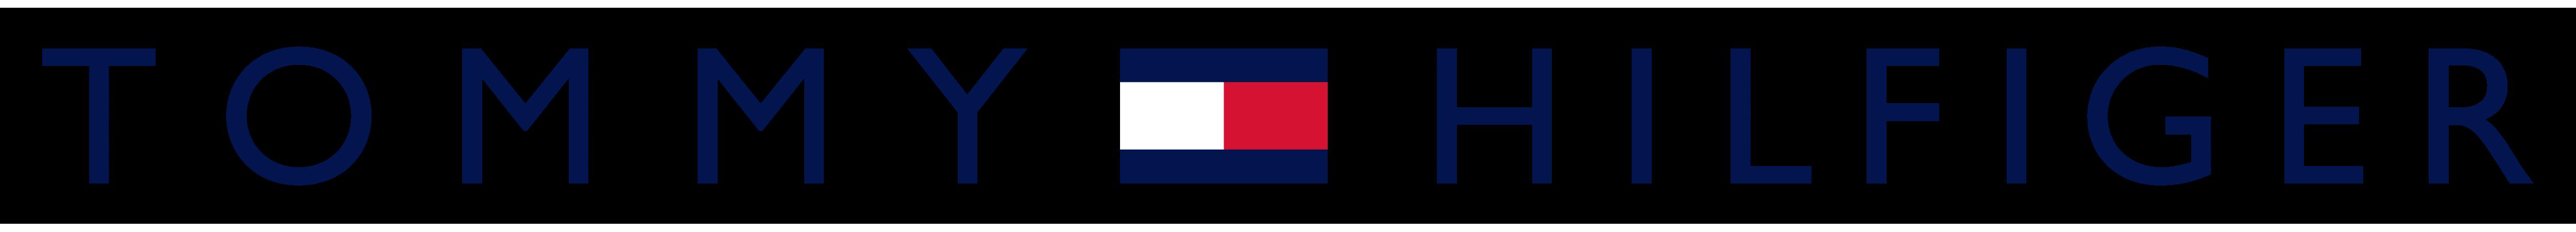 Tommy Hilfiger - Logo